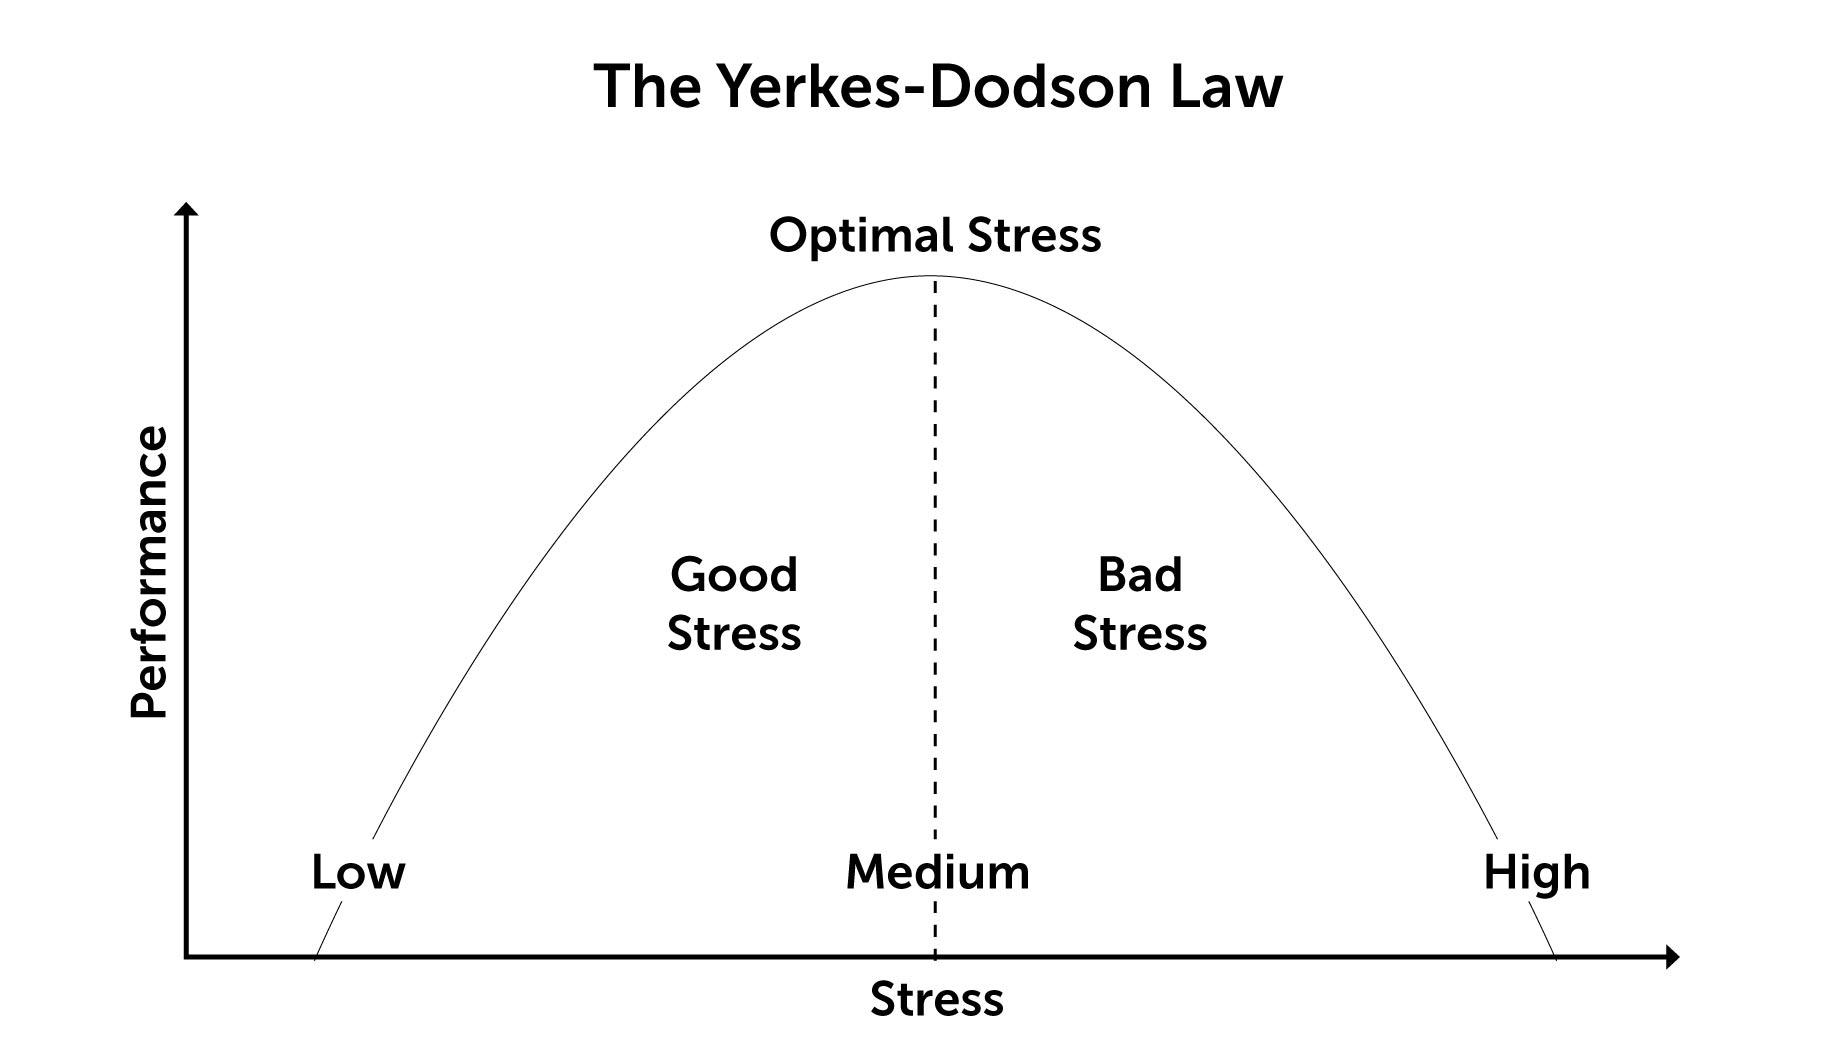 The Yerkes-Dodson Law